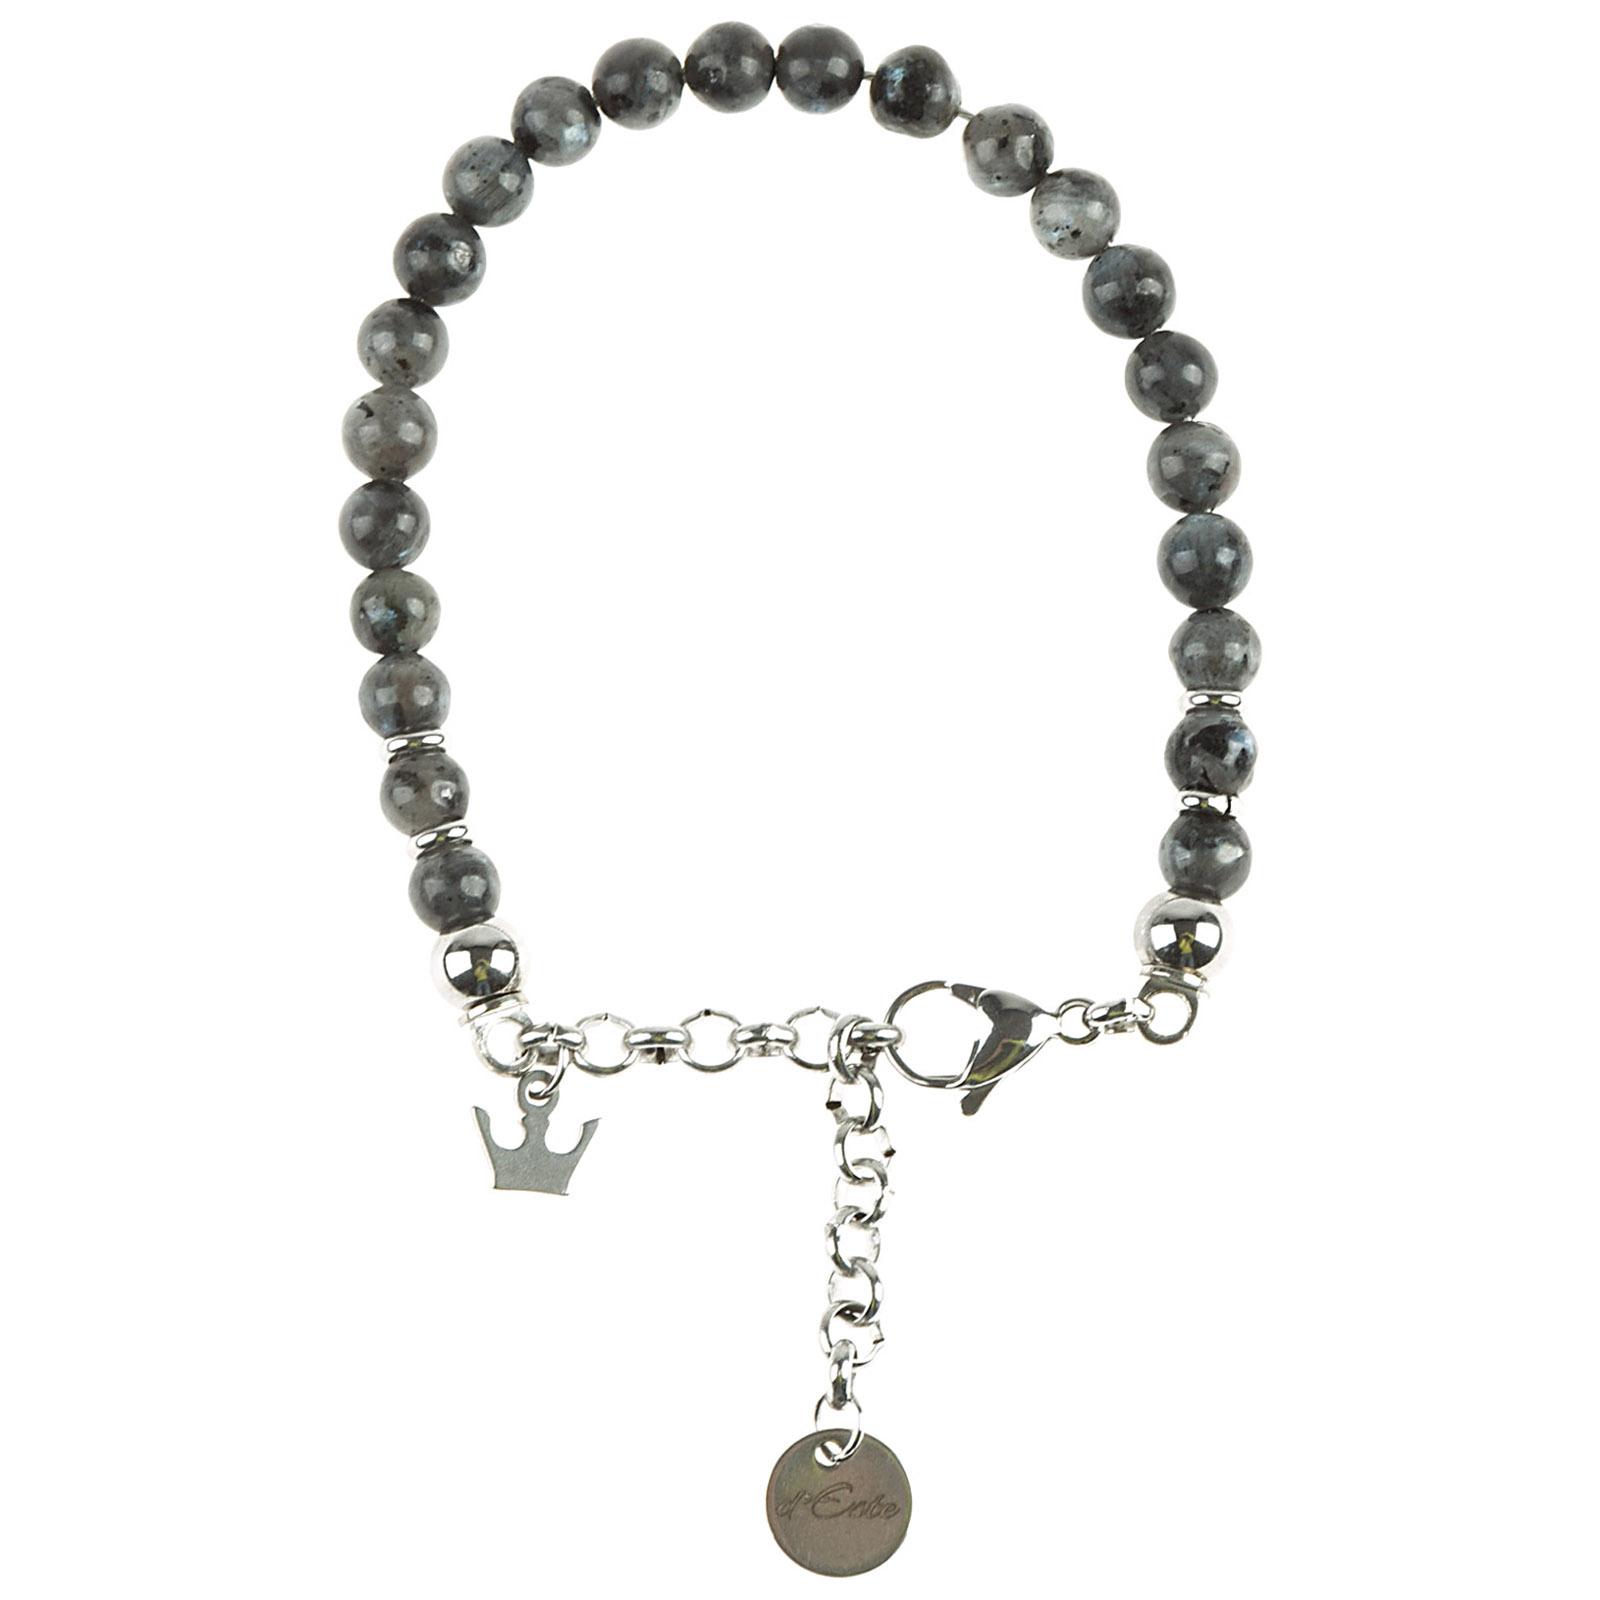 Bracelet D Este Fg503 Grigio